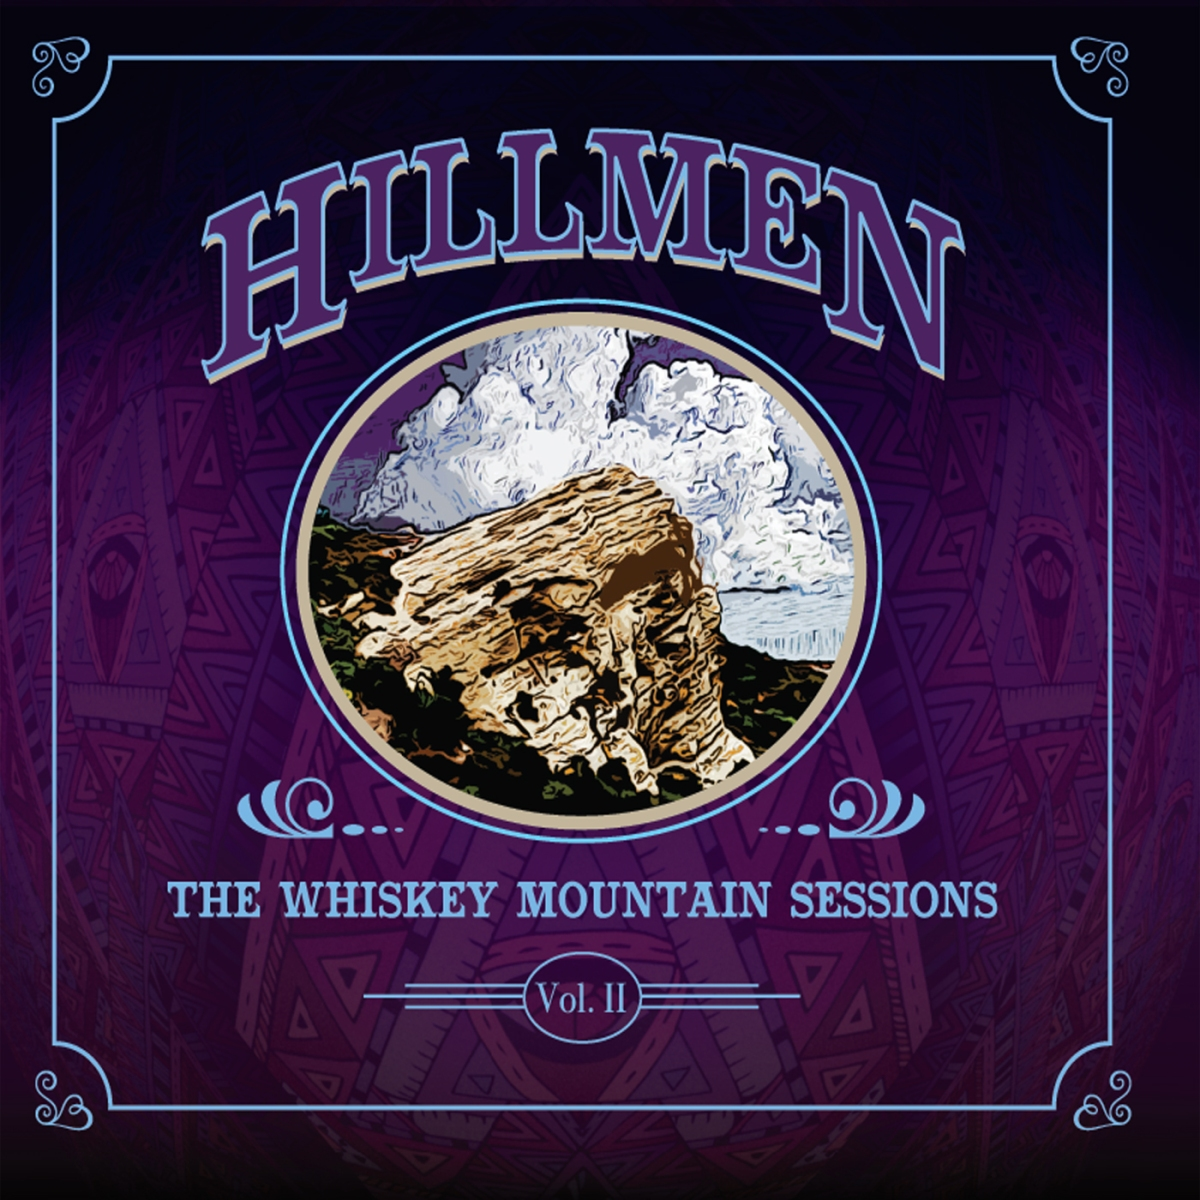 Hillmen Whiskey Mountain Sessions Volume 2